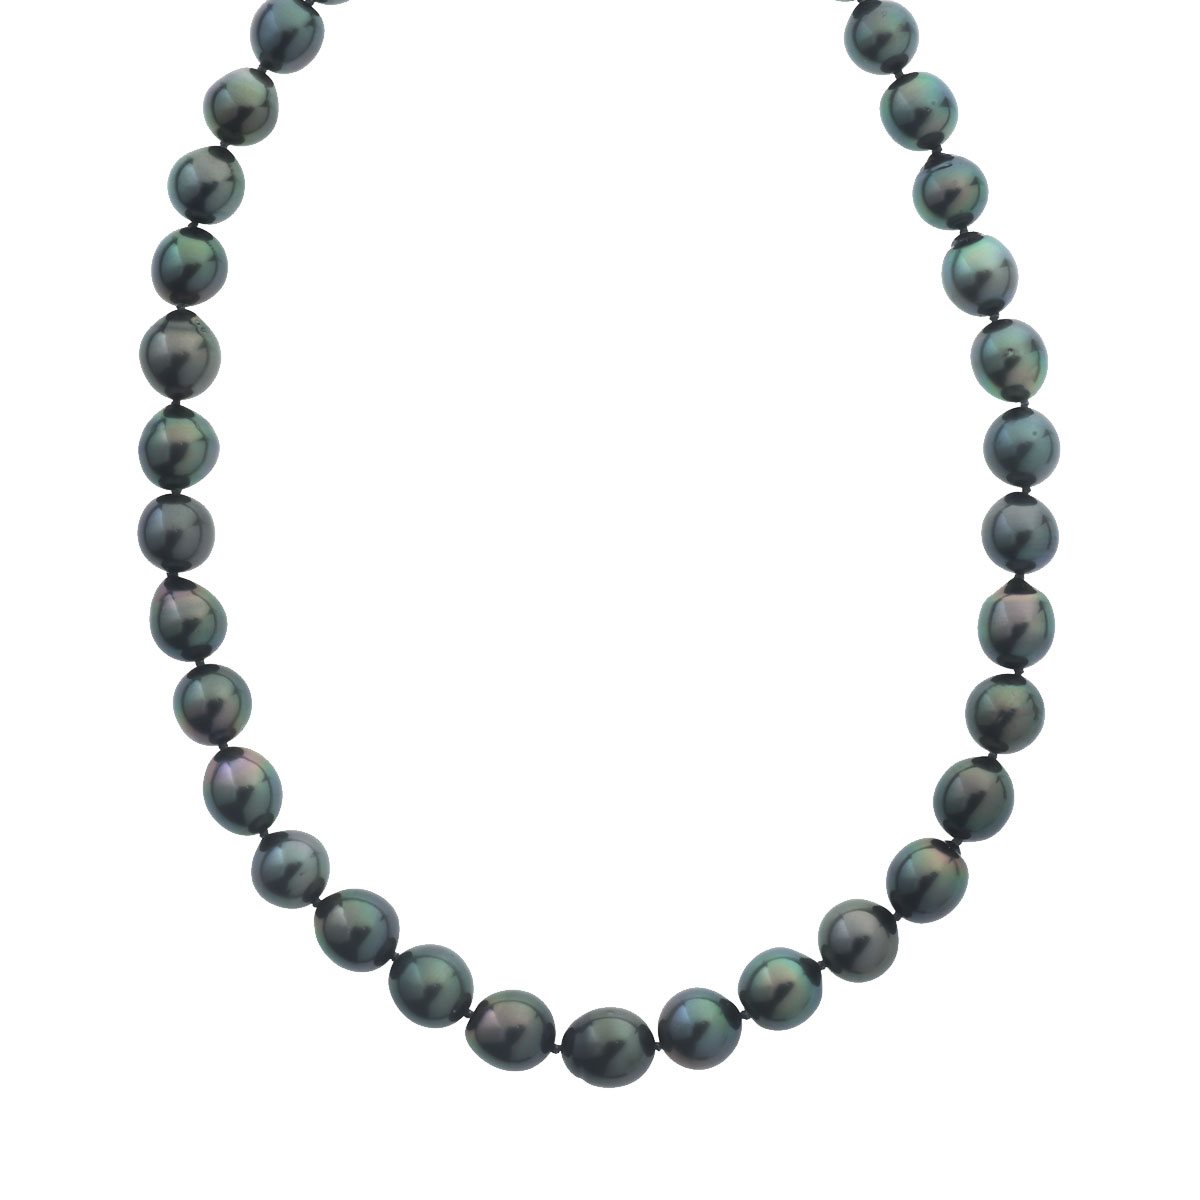 collier or 750 jaune perles de culture de tahiti femme collier maty. Black Bedroom Furniture Sets. Home Design Ideas